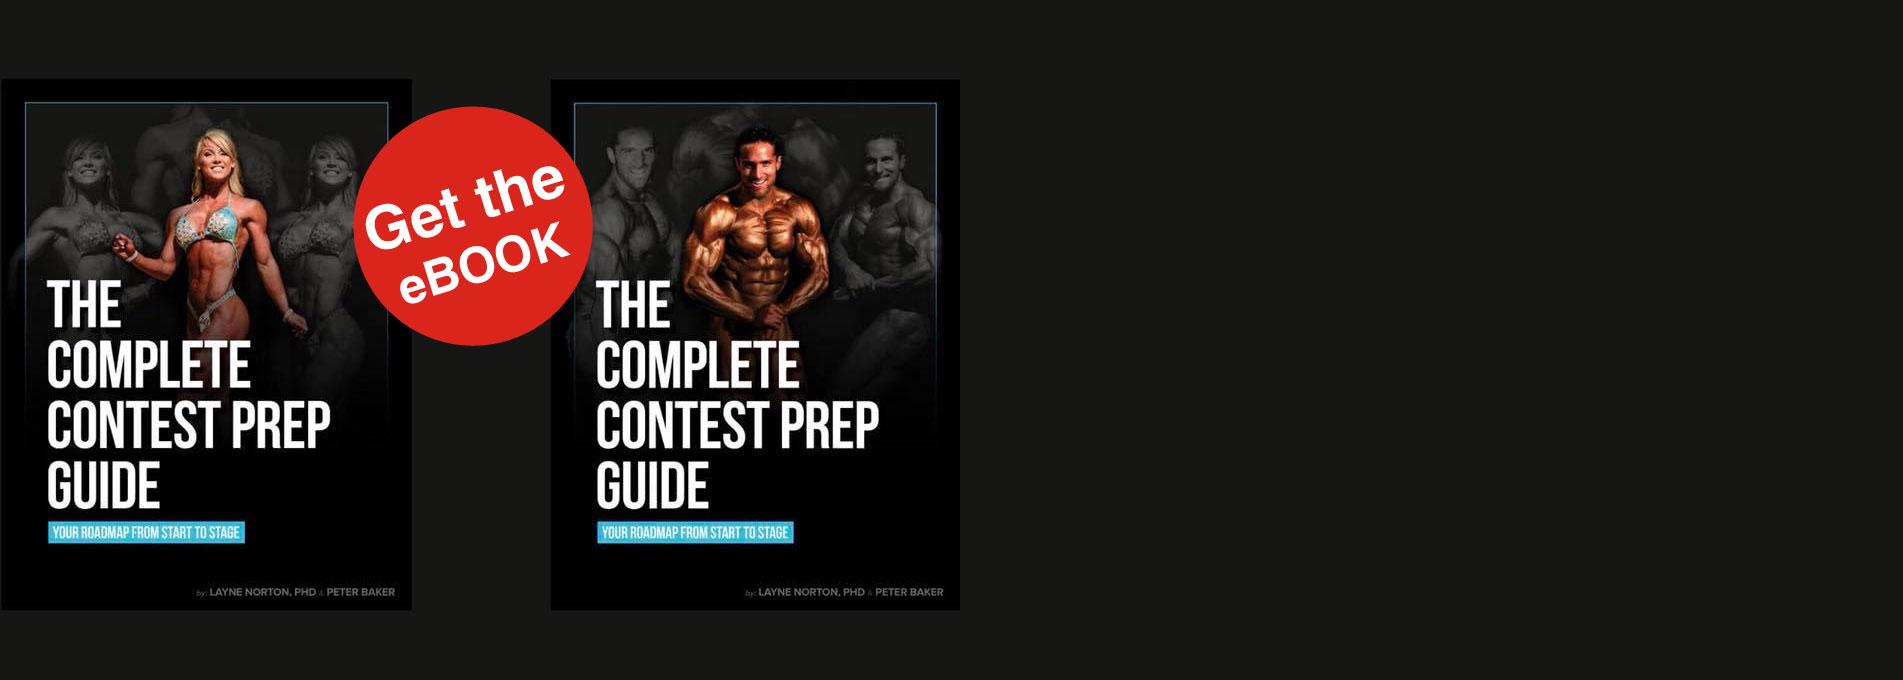 The Complete Contest Prep Guide